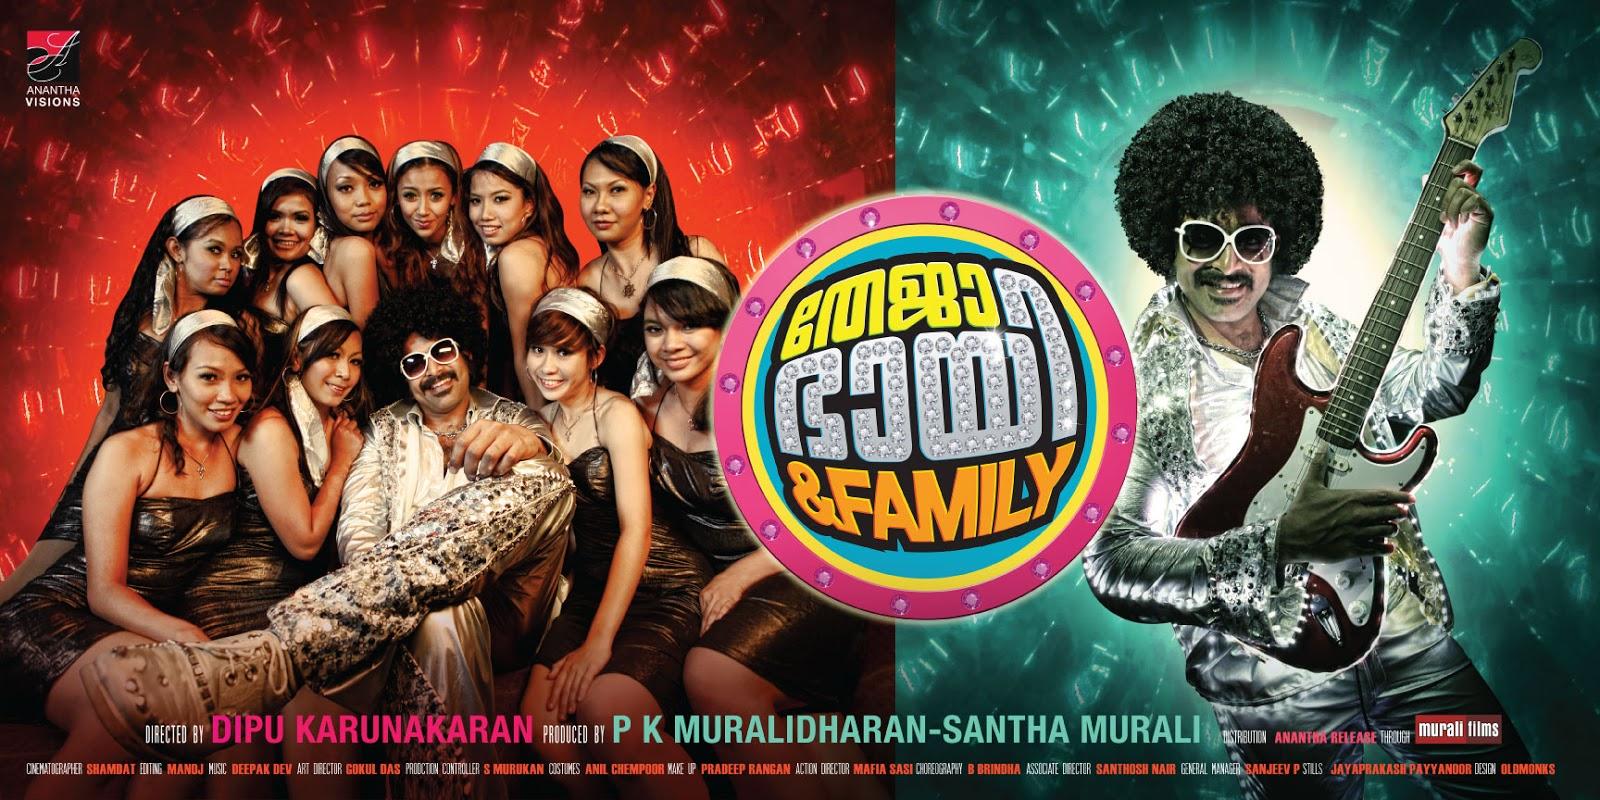 Malayalam songs teja bhai family 2011 hq studio rip for K muraleedharan family photo